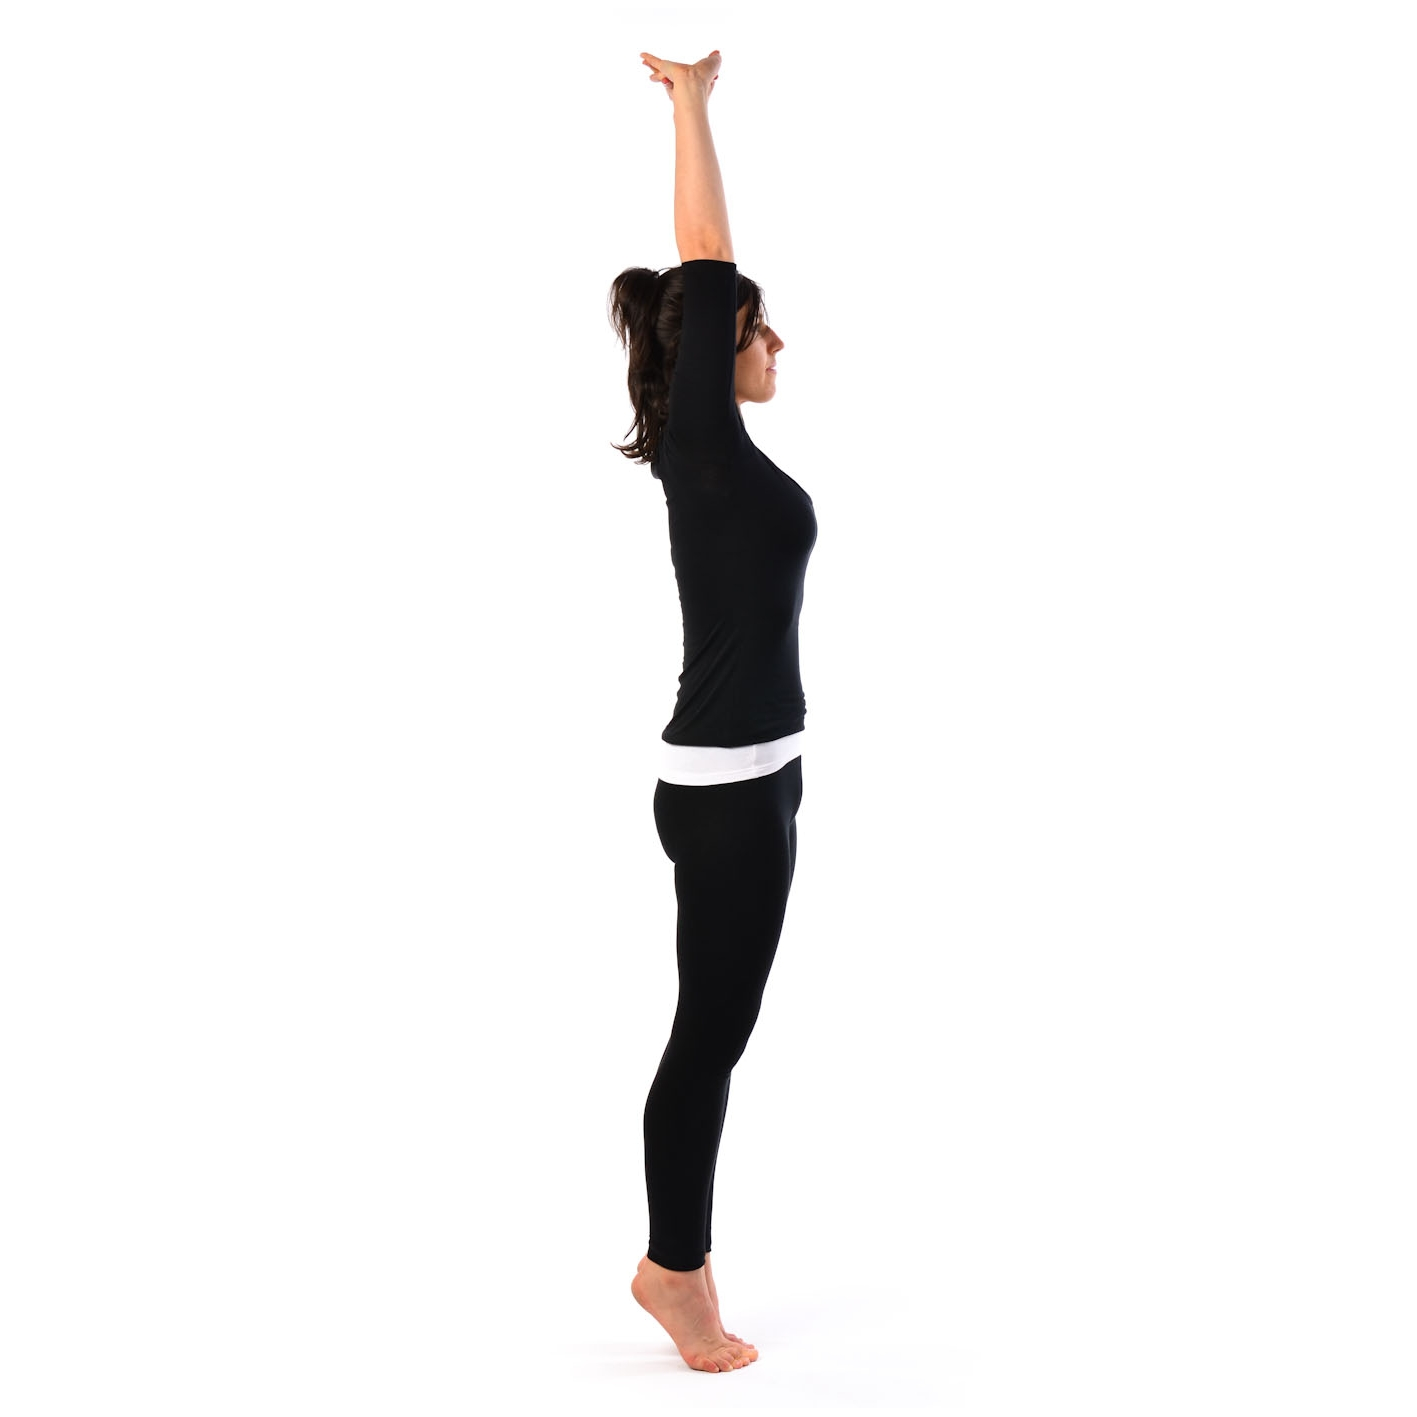 Tadasana Yoga Pose Png - Benefits Of Tadasana (Palm Tree Pose), Transparent background PNG HD thumbnail